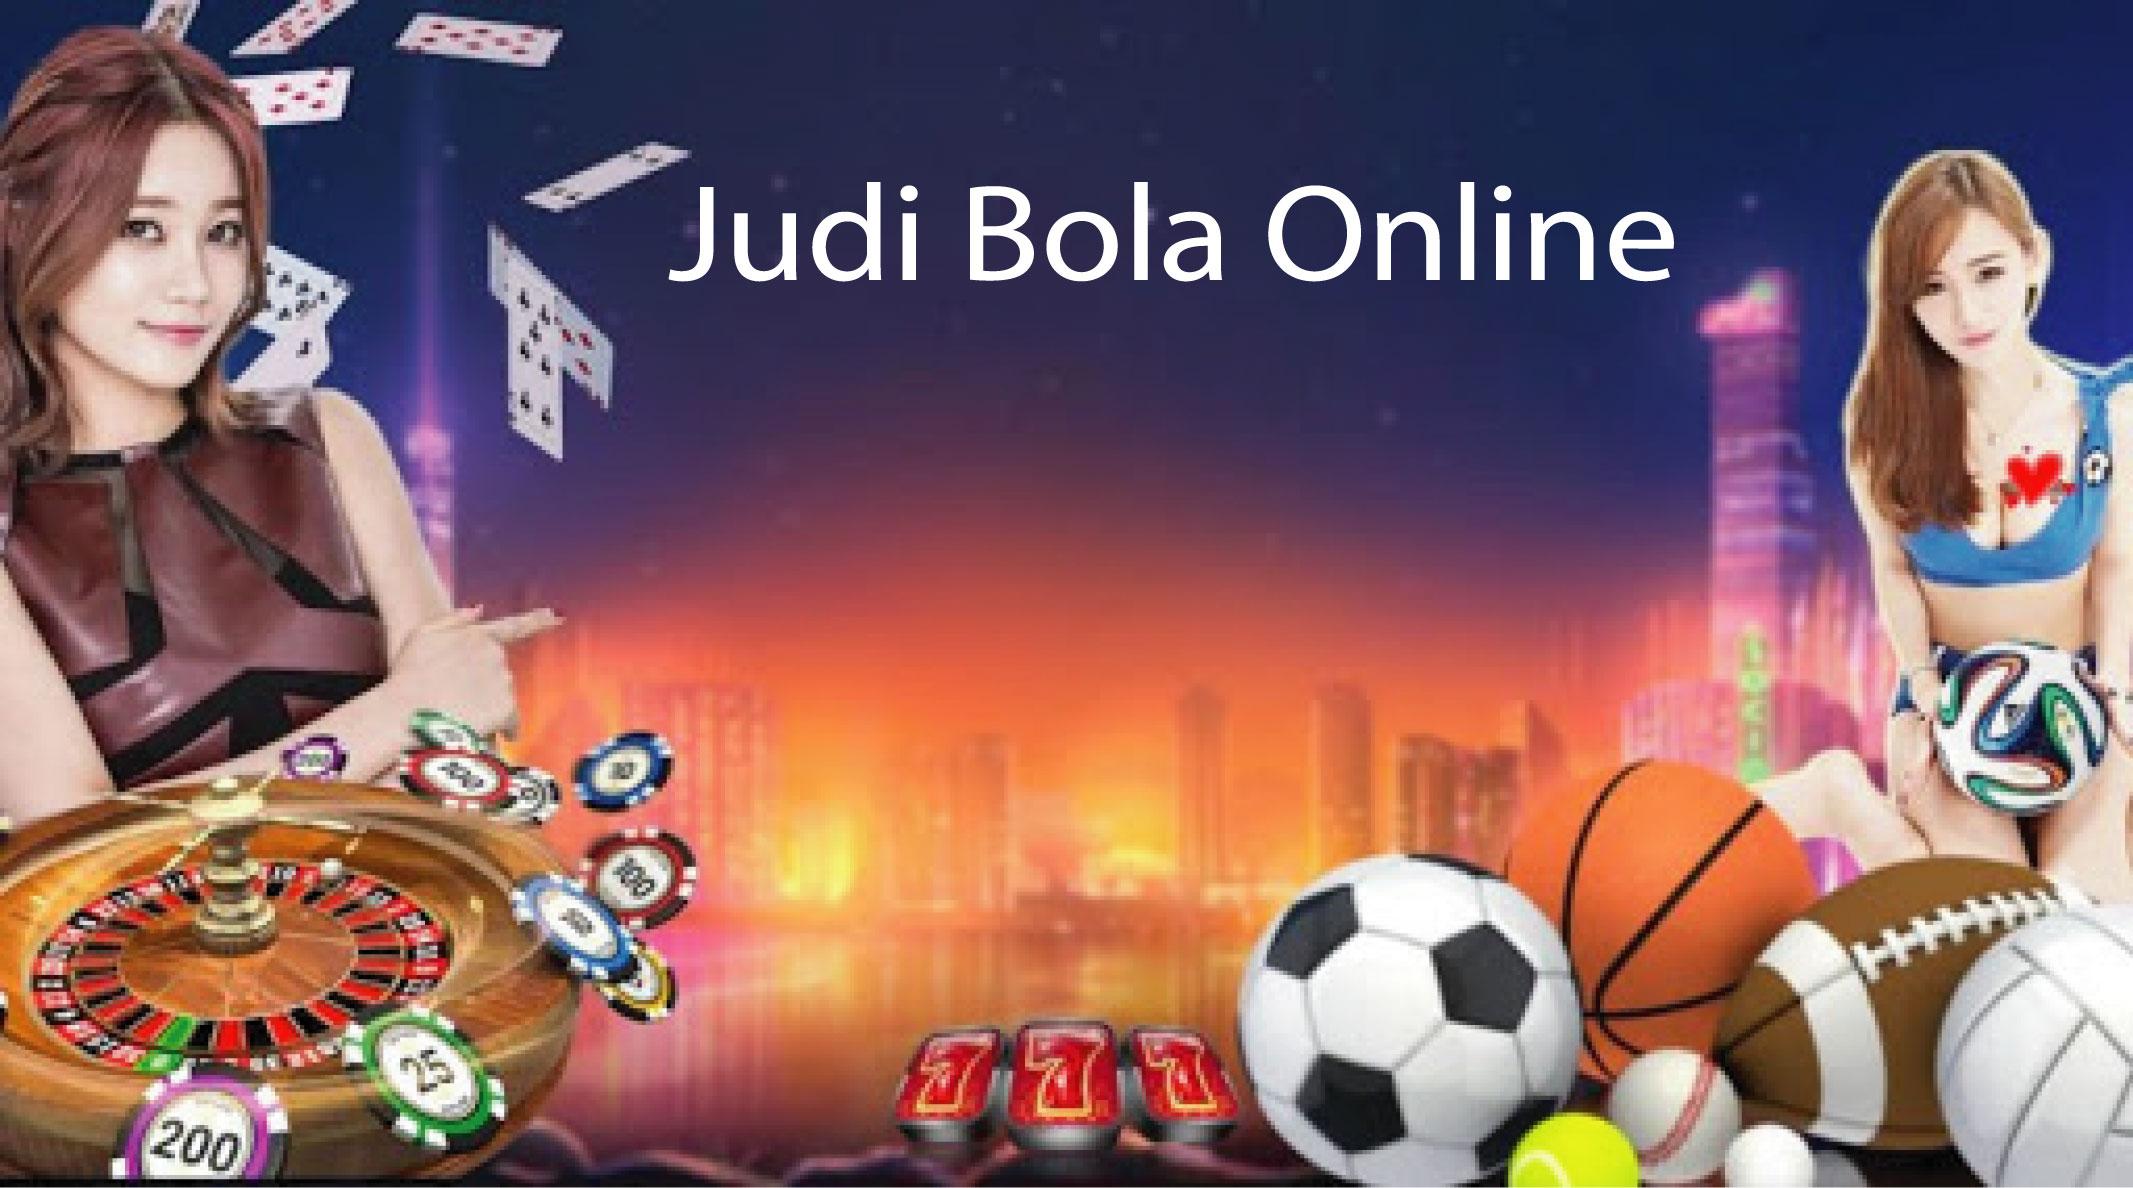 Best Gambling Websites – How to Find The Best Online Gambling Sites